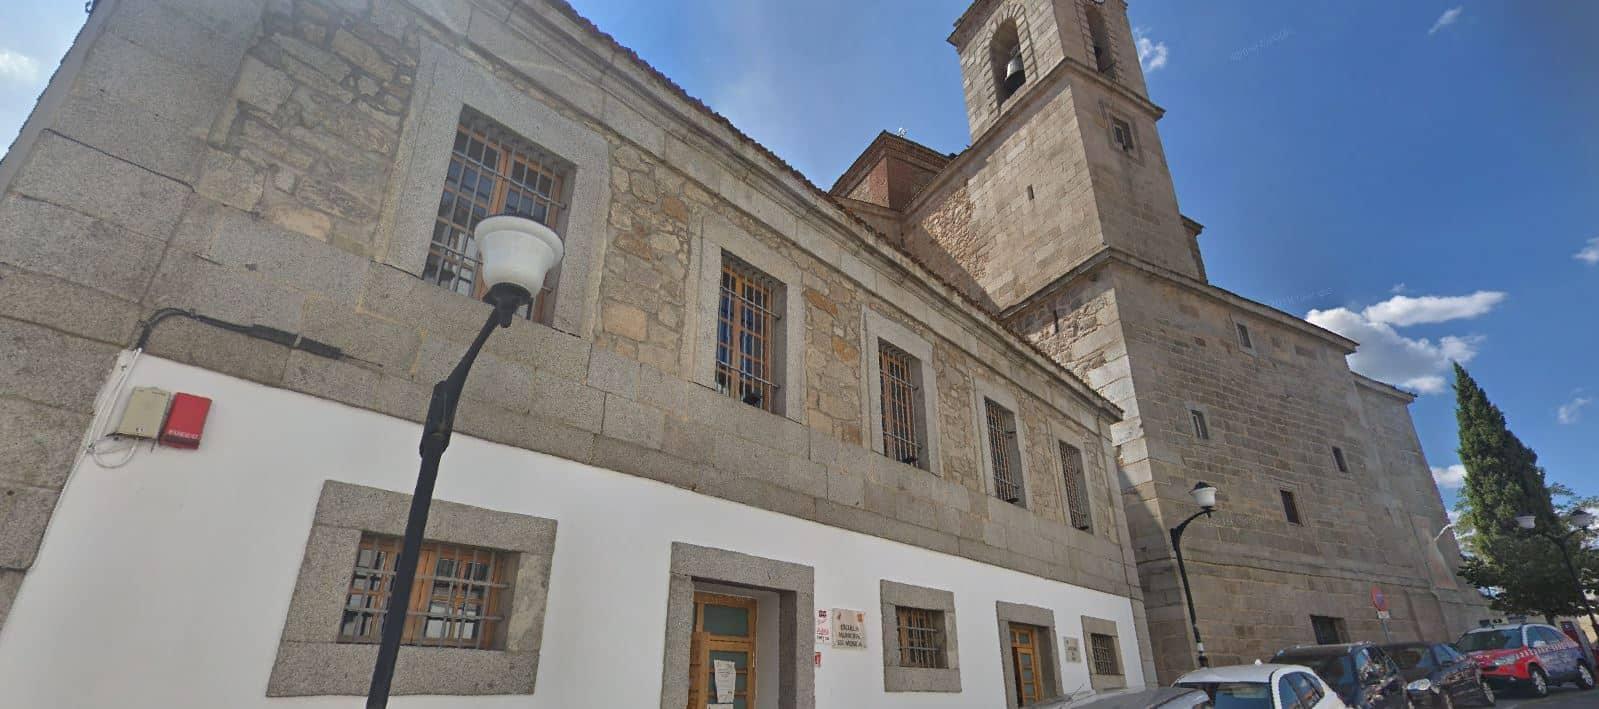 Certificado de Matrimonio San Martín de Valdeiglesias